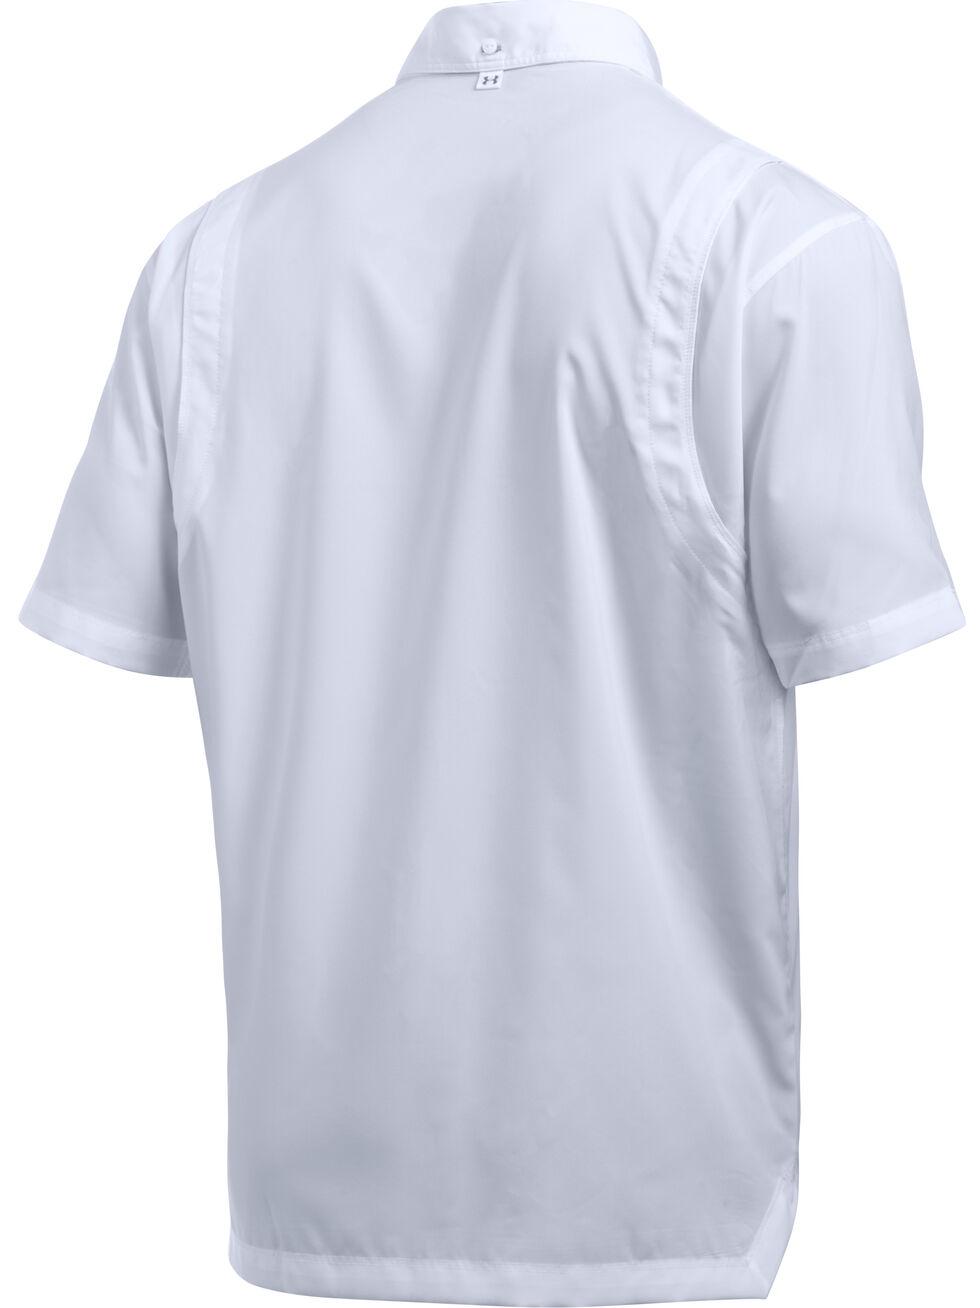 Under Armour Men's Tide Chaser Short Sleeve Shirt, White, hi-res